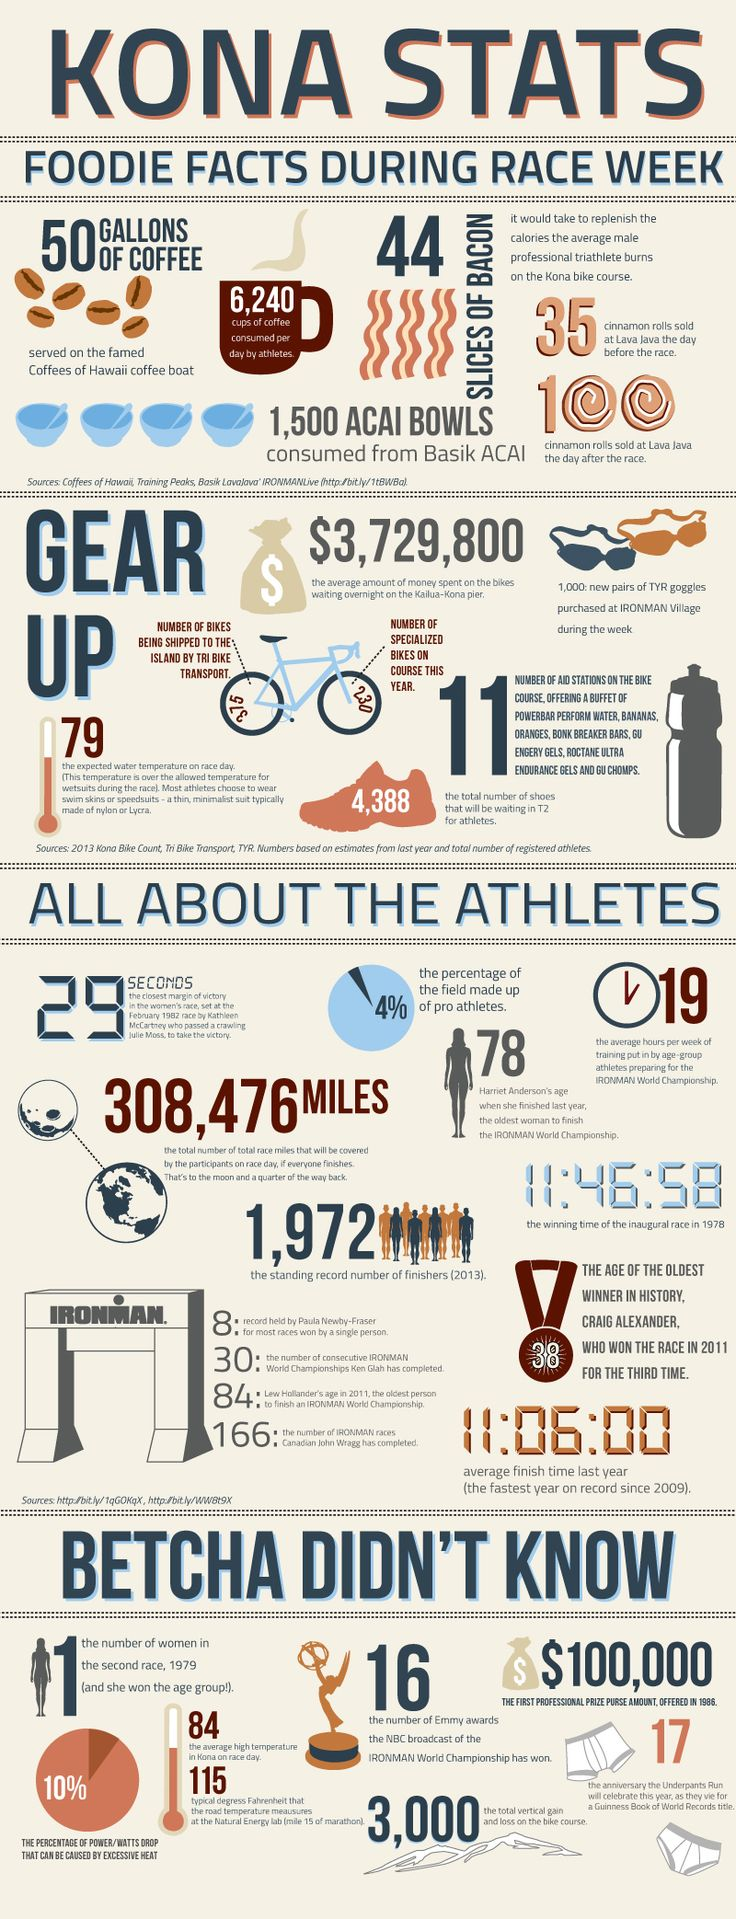 Los mejores datos del Ironman Kona Worldchampionship.